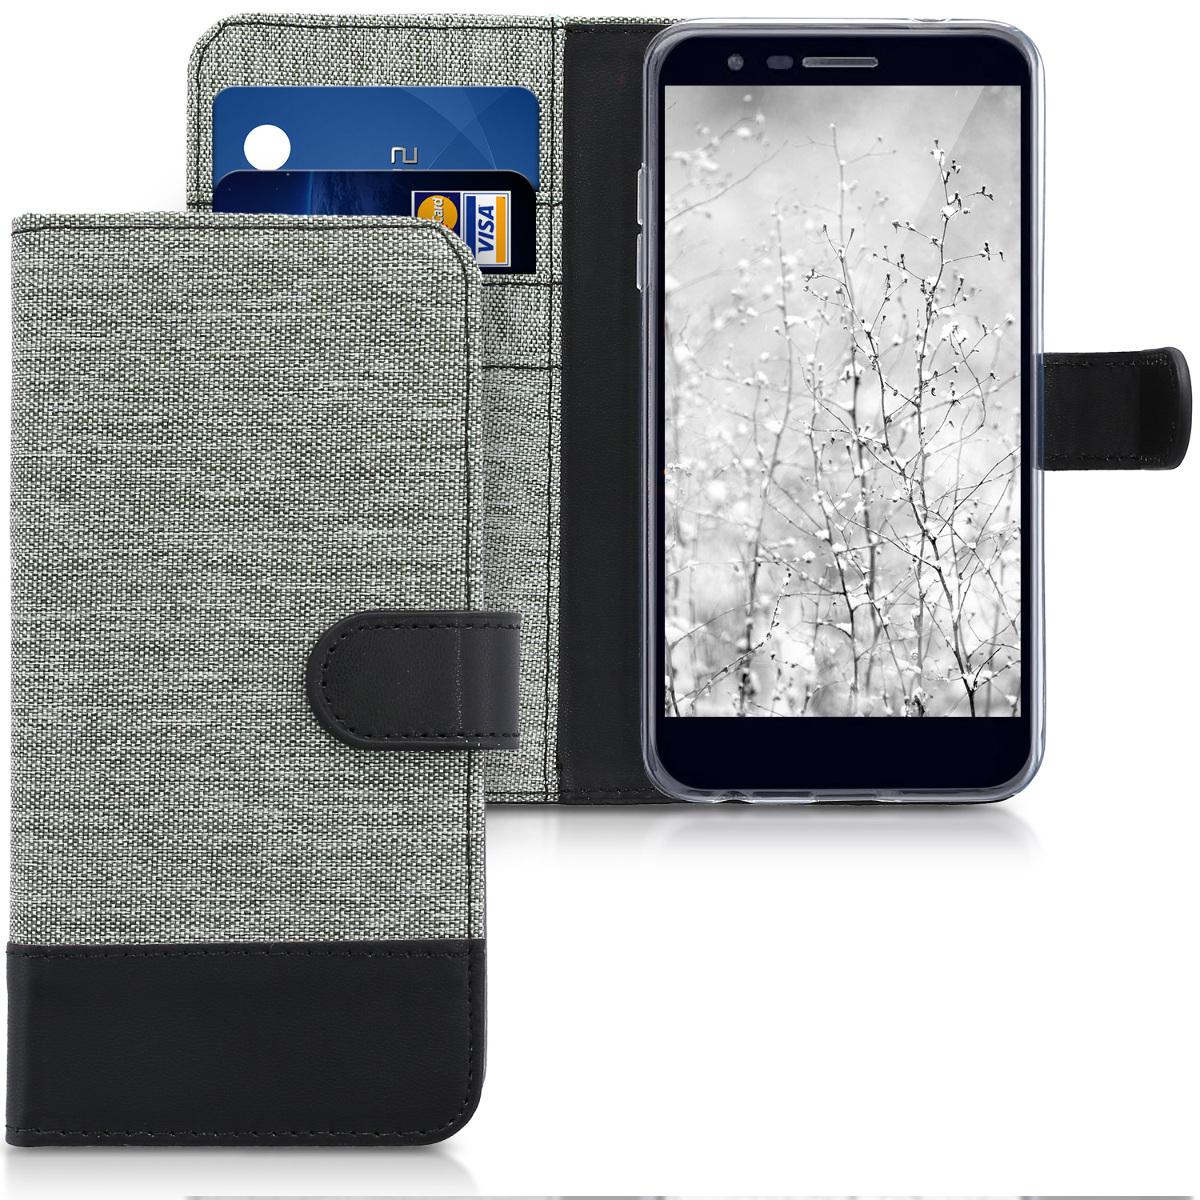 KW Canvas Θήκη Πορτοφόλι LG K11 / K11+ / K10 (2018) - Grey / Black (44554.22)